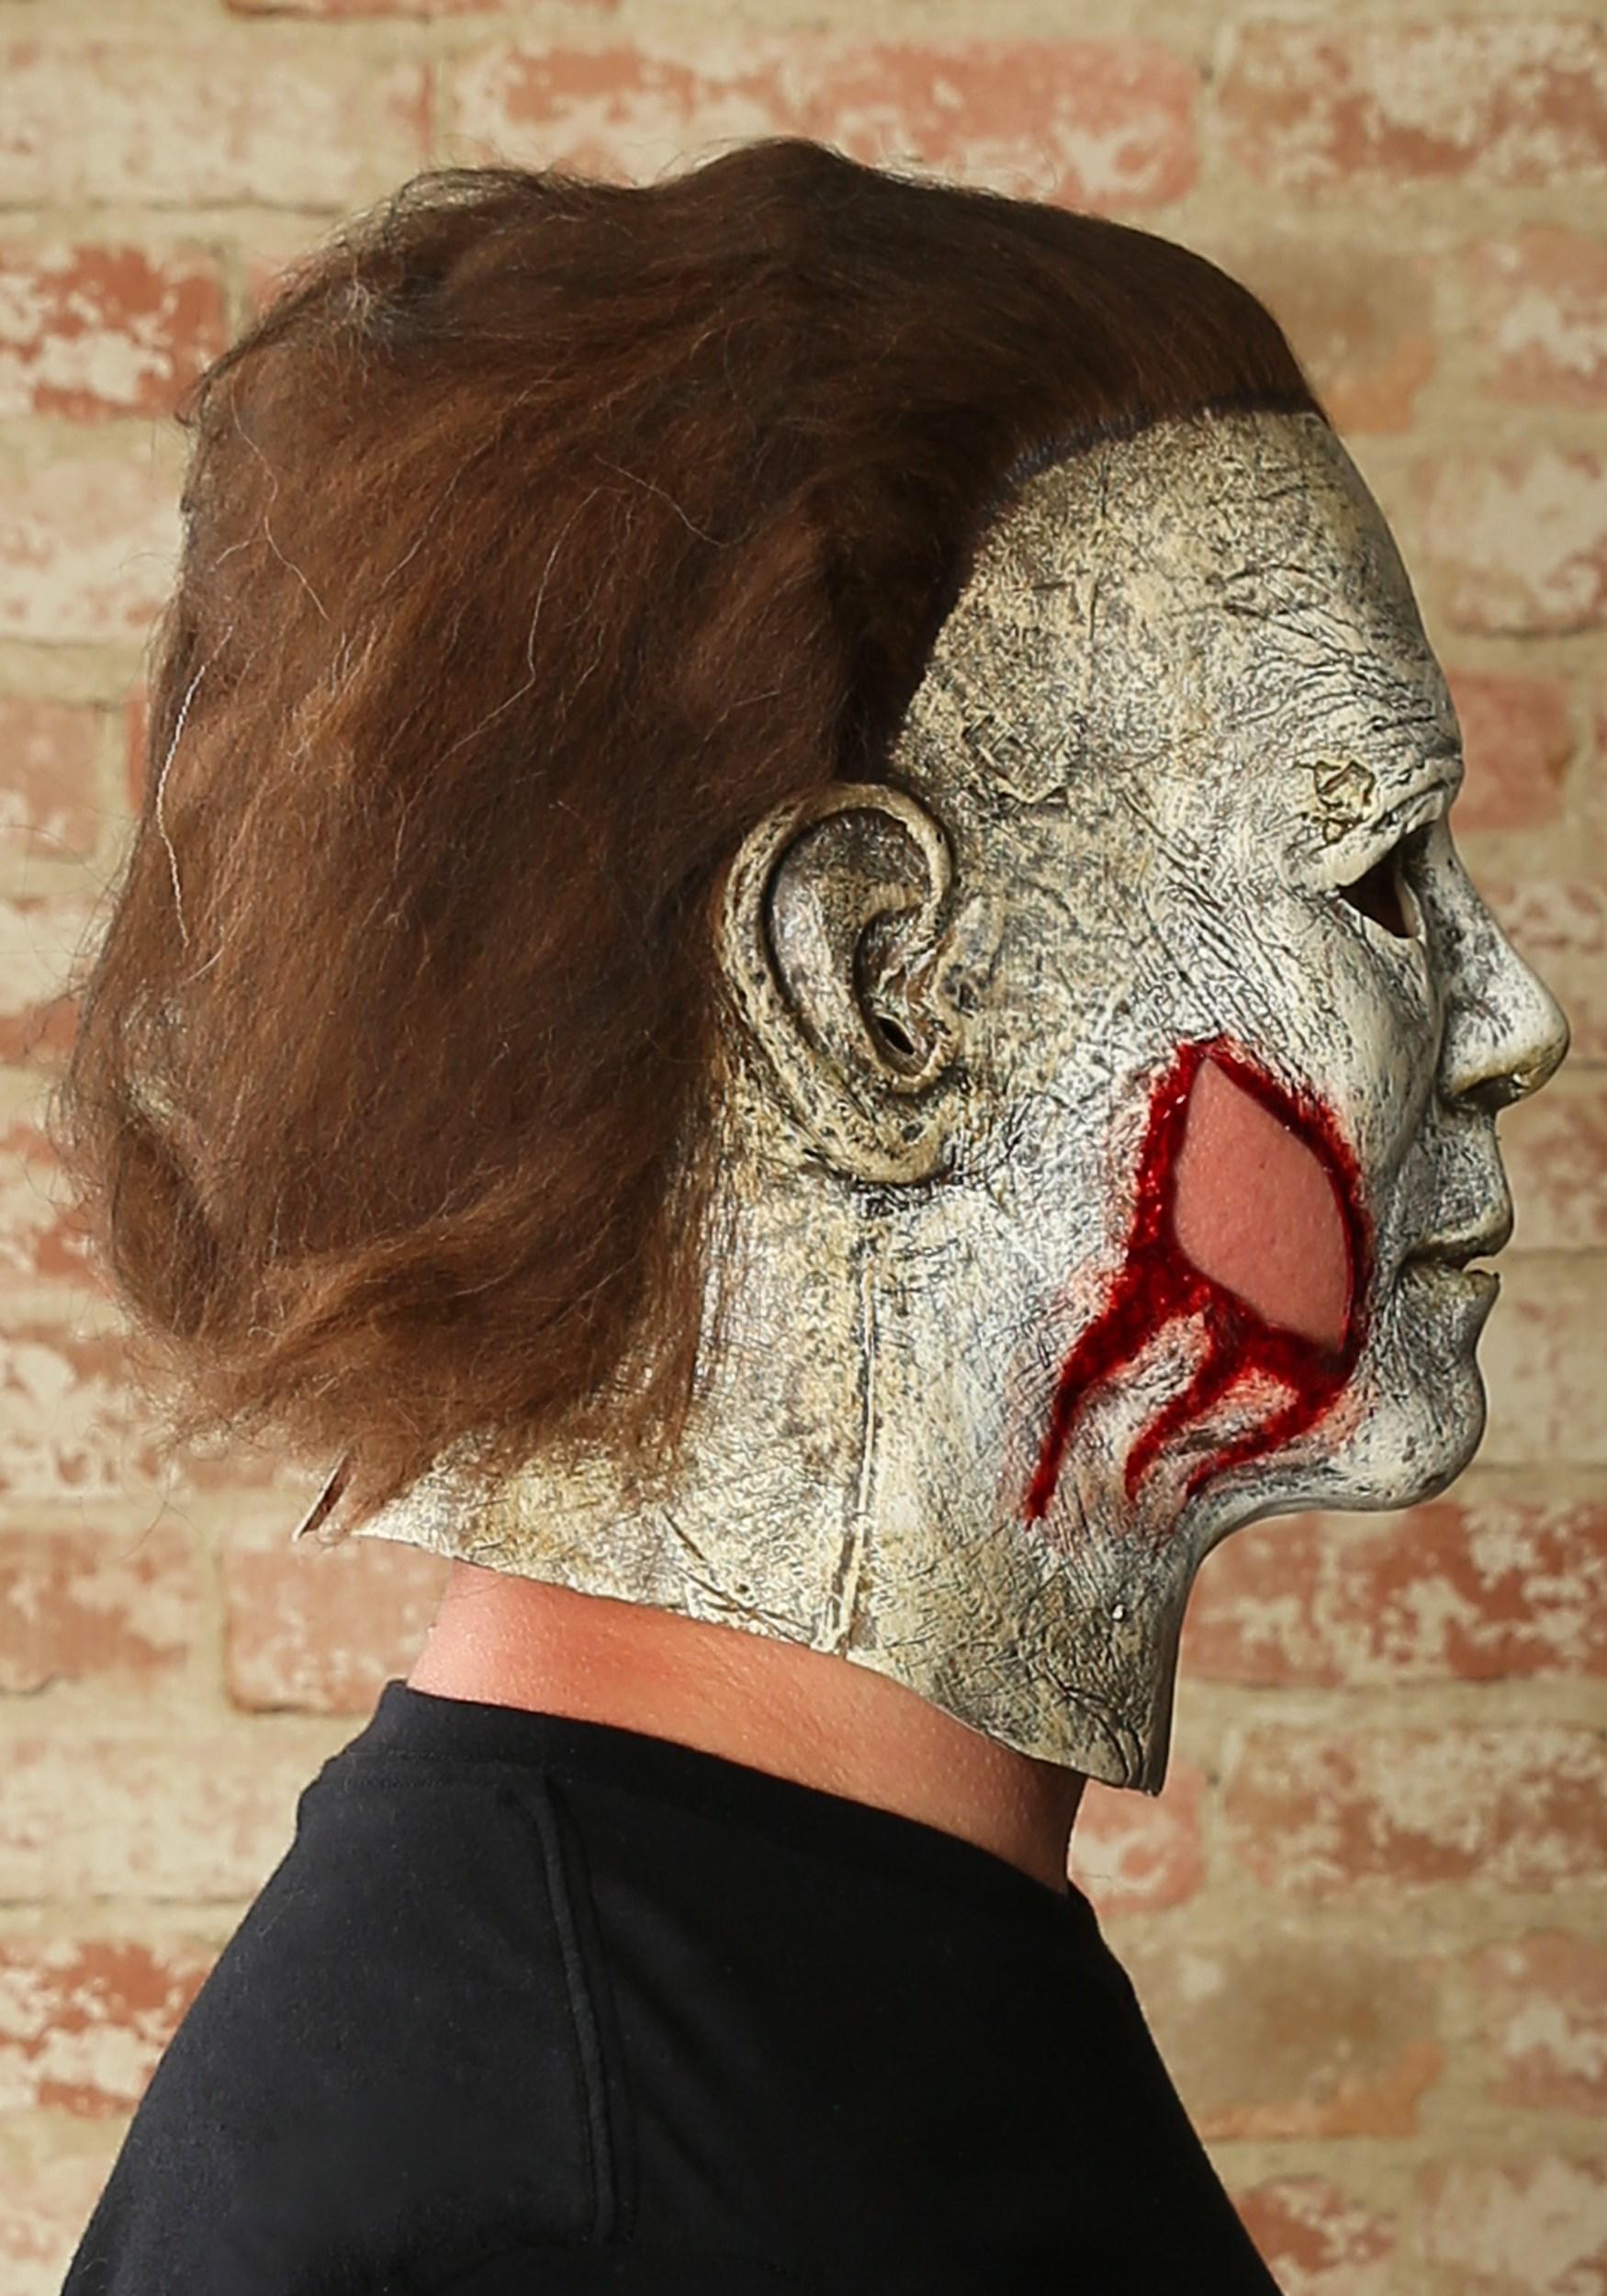 Halloween 2018 Michael Myers Mask.Michael Myers Final Battle Mask Halloween 2018